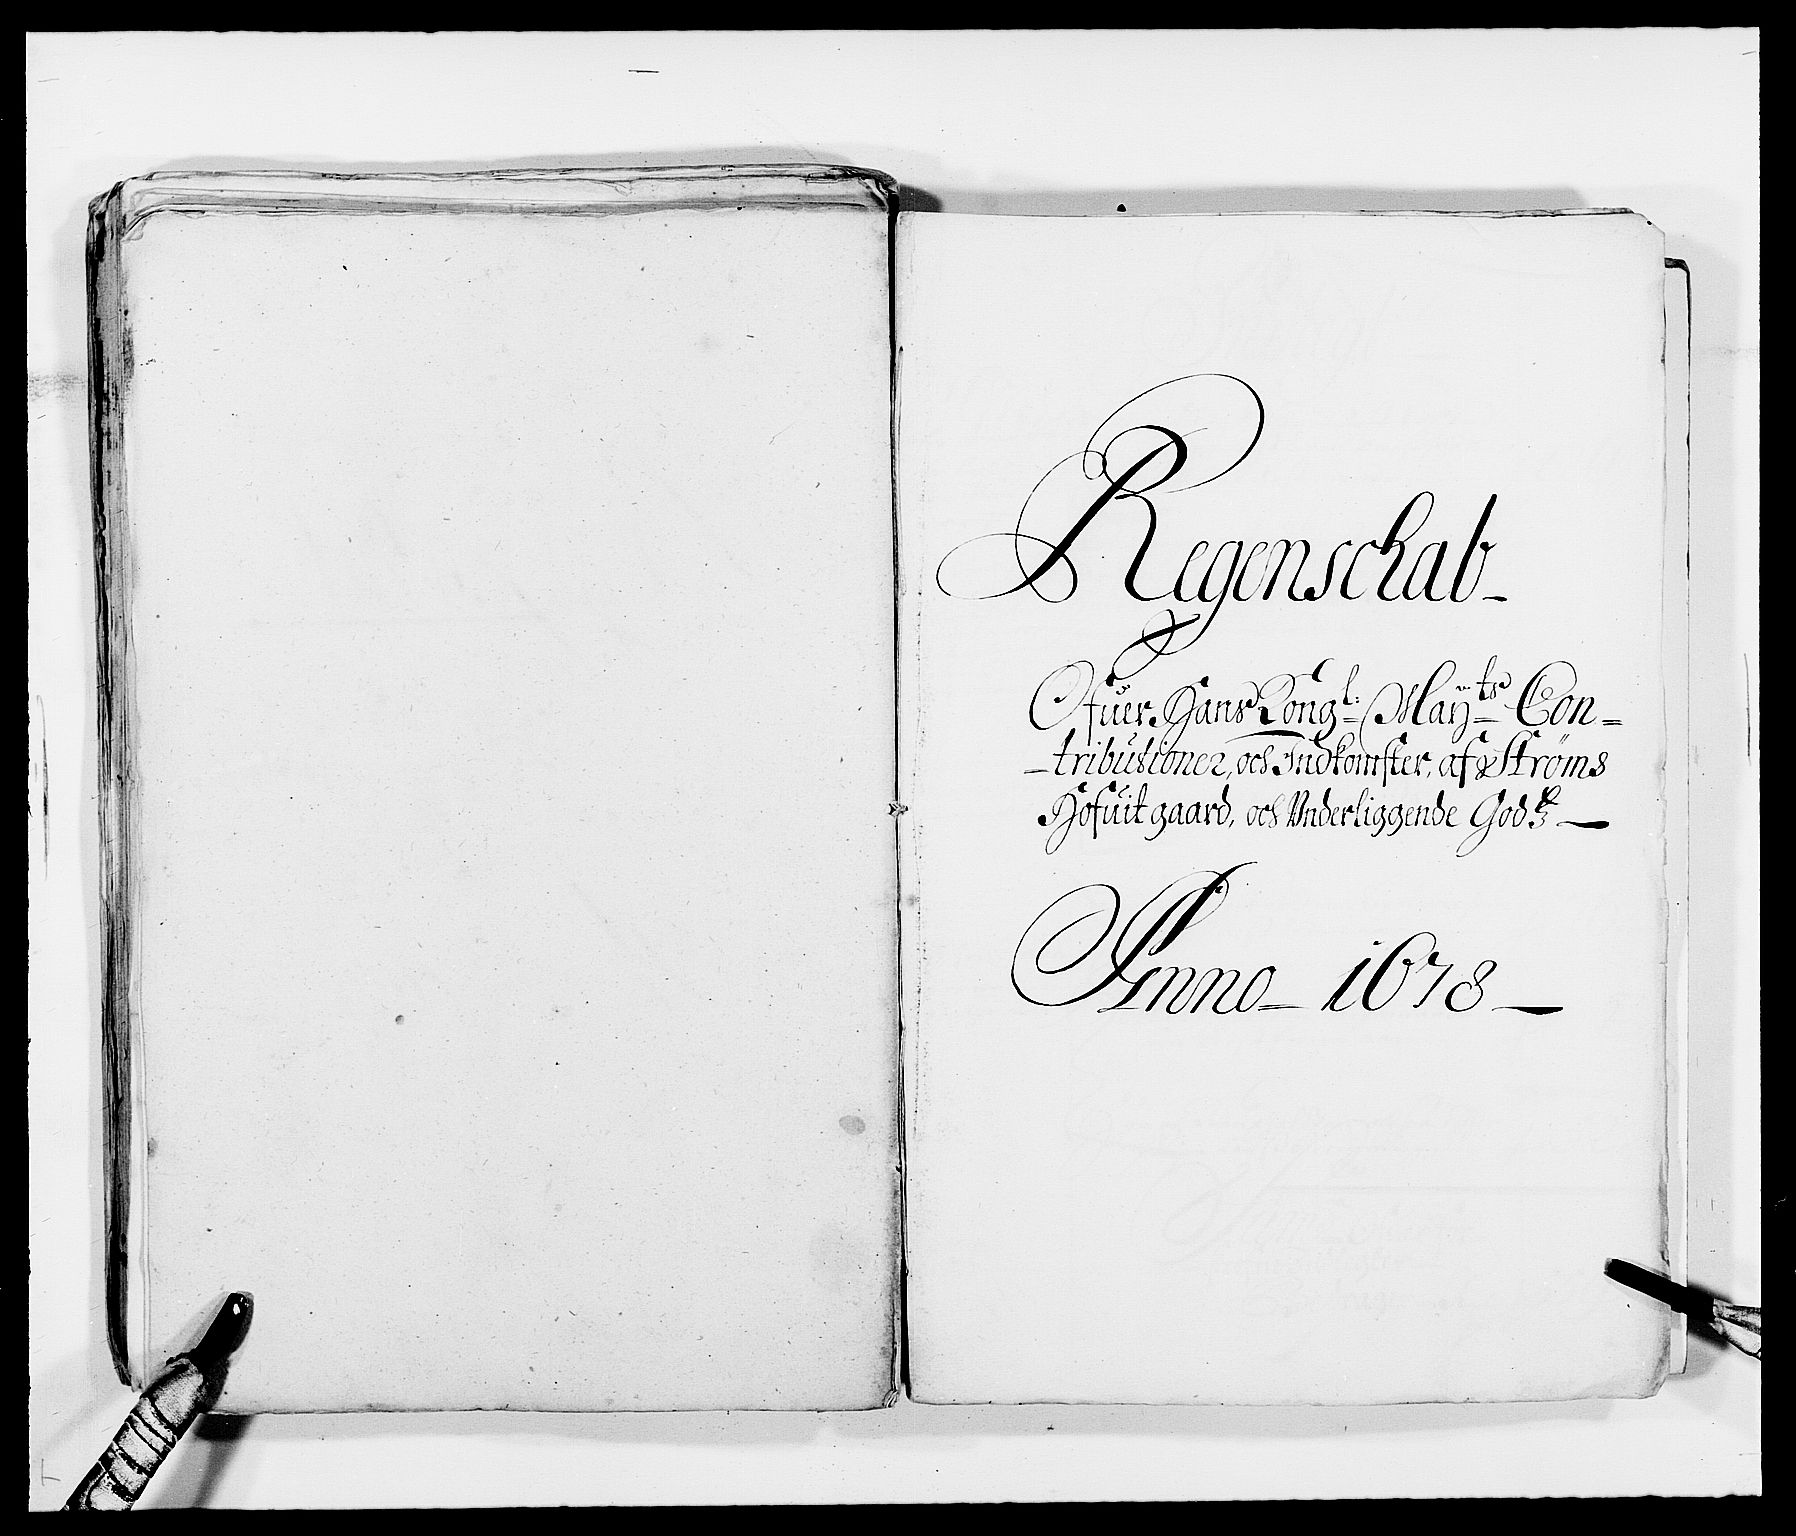 RA, Rentekammeret inntil 1814, Reviderte regnskaper, Fogderegnskap, R32/L1845: Fogderegnskap Jarlsberg grevskap, 1676-1678, s. 74